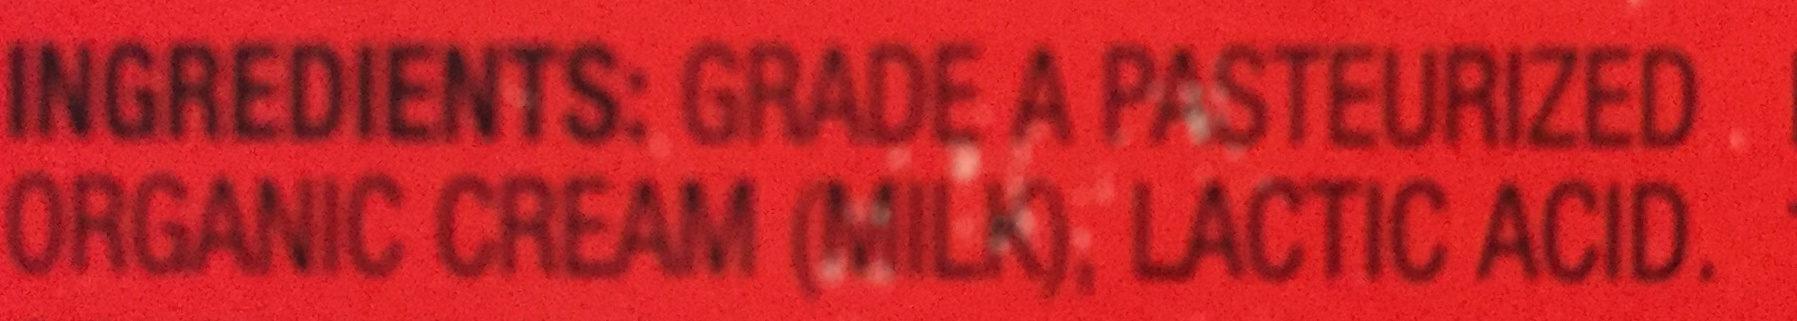 Organic butter - Ingredients - en